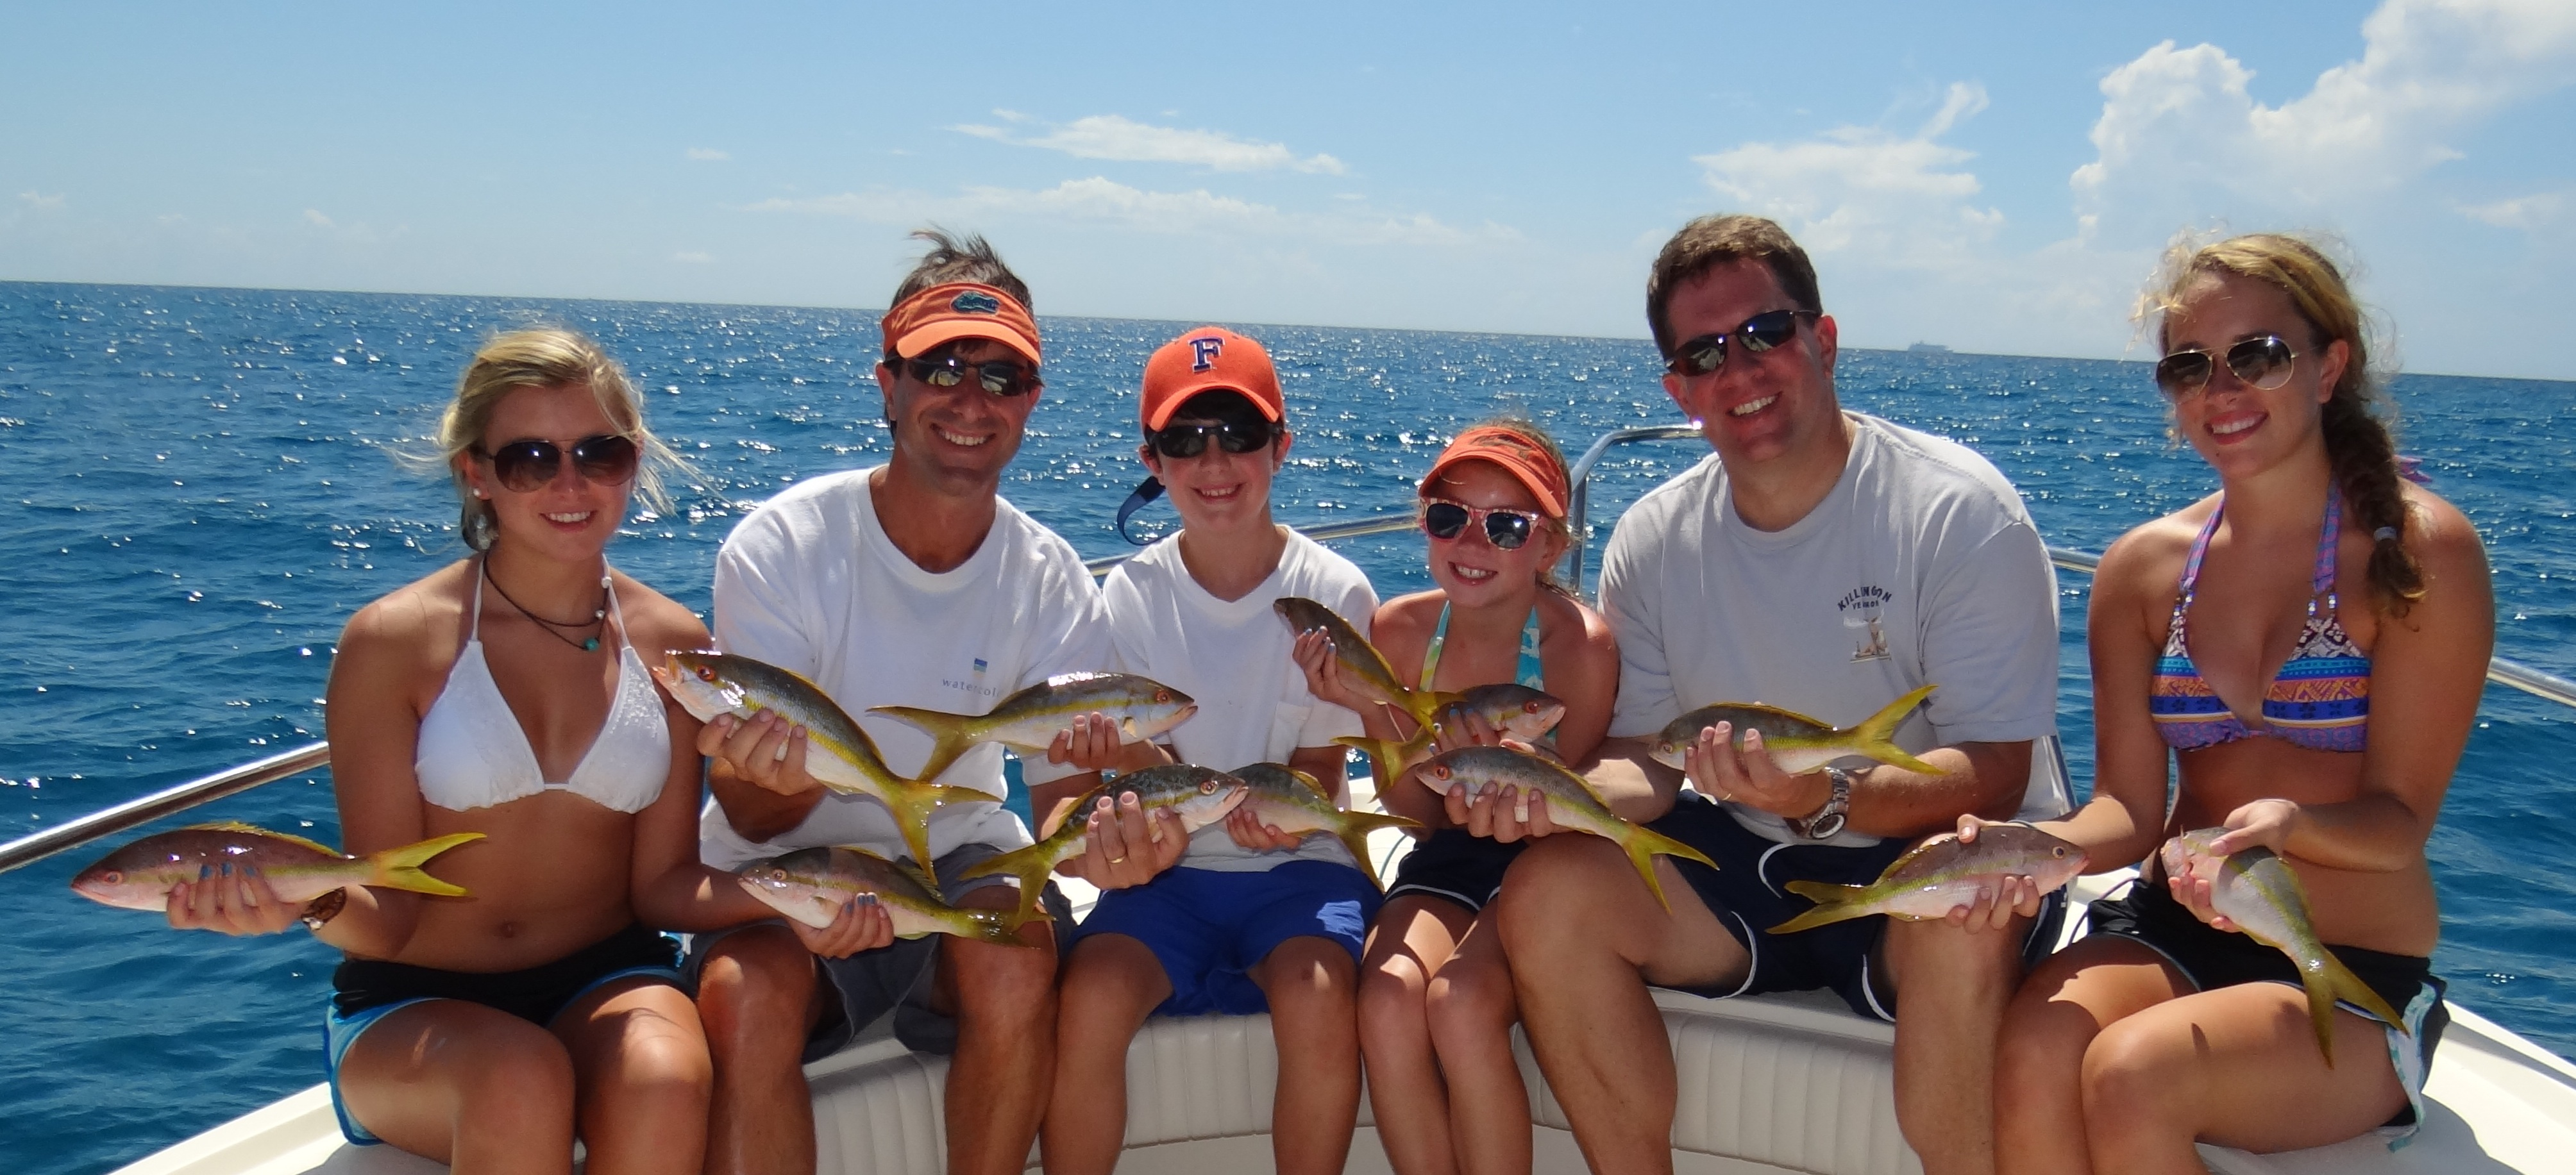 Patch reefs seasquared charters for Fishing marathon fl